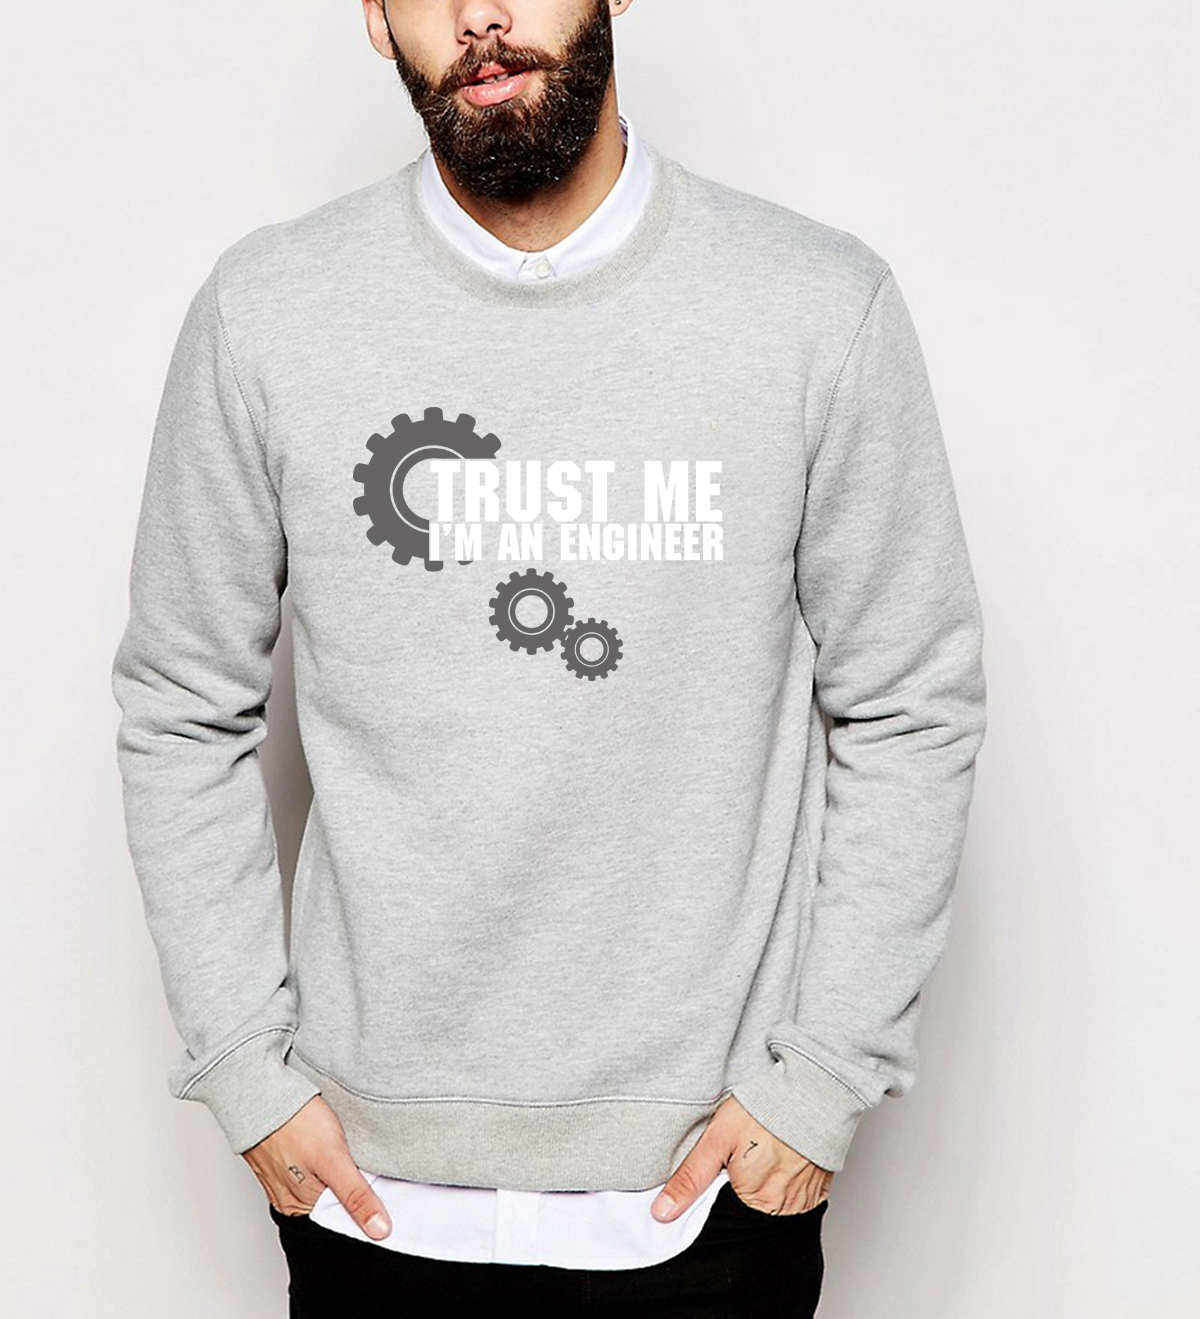 Funny harajuku man's top quality clothing men 2019 new autumn sweatshirts winter fashion fleece hoodies hip hop style tracksuits